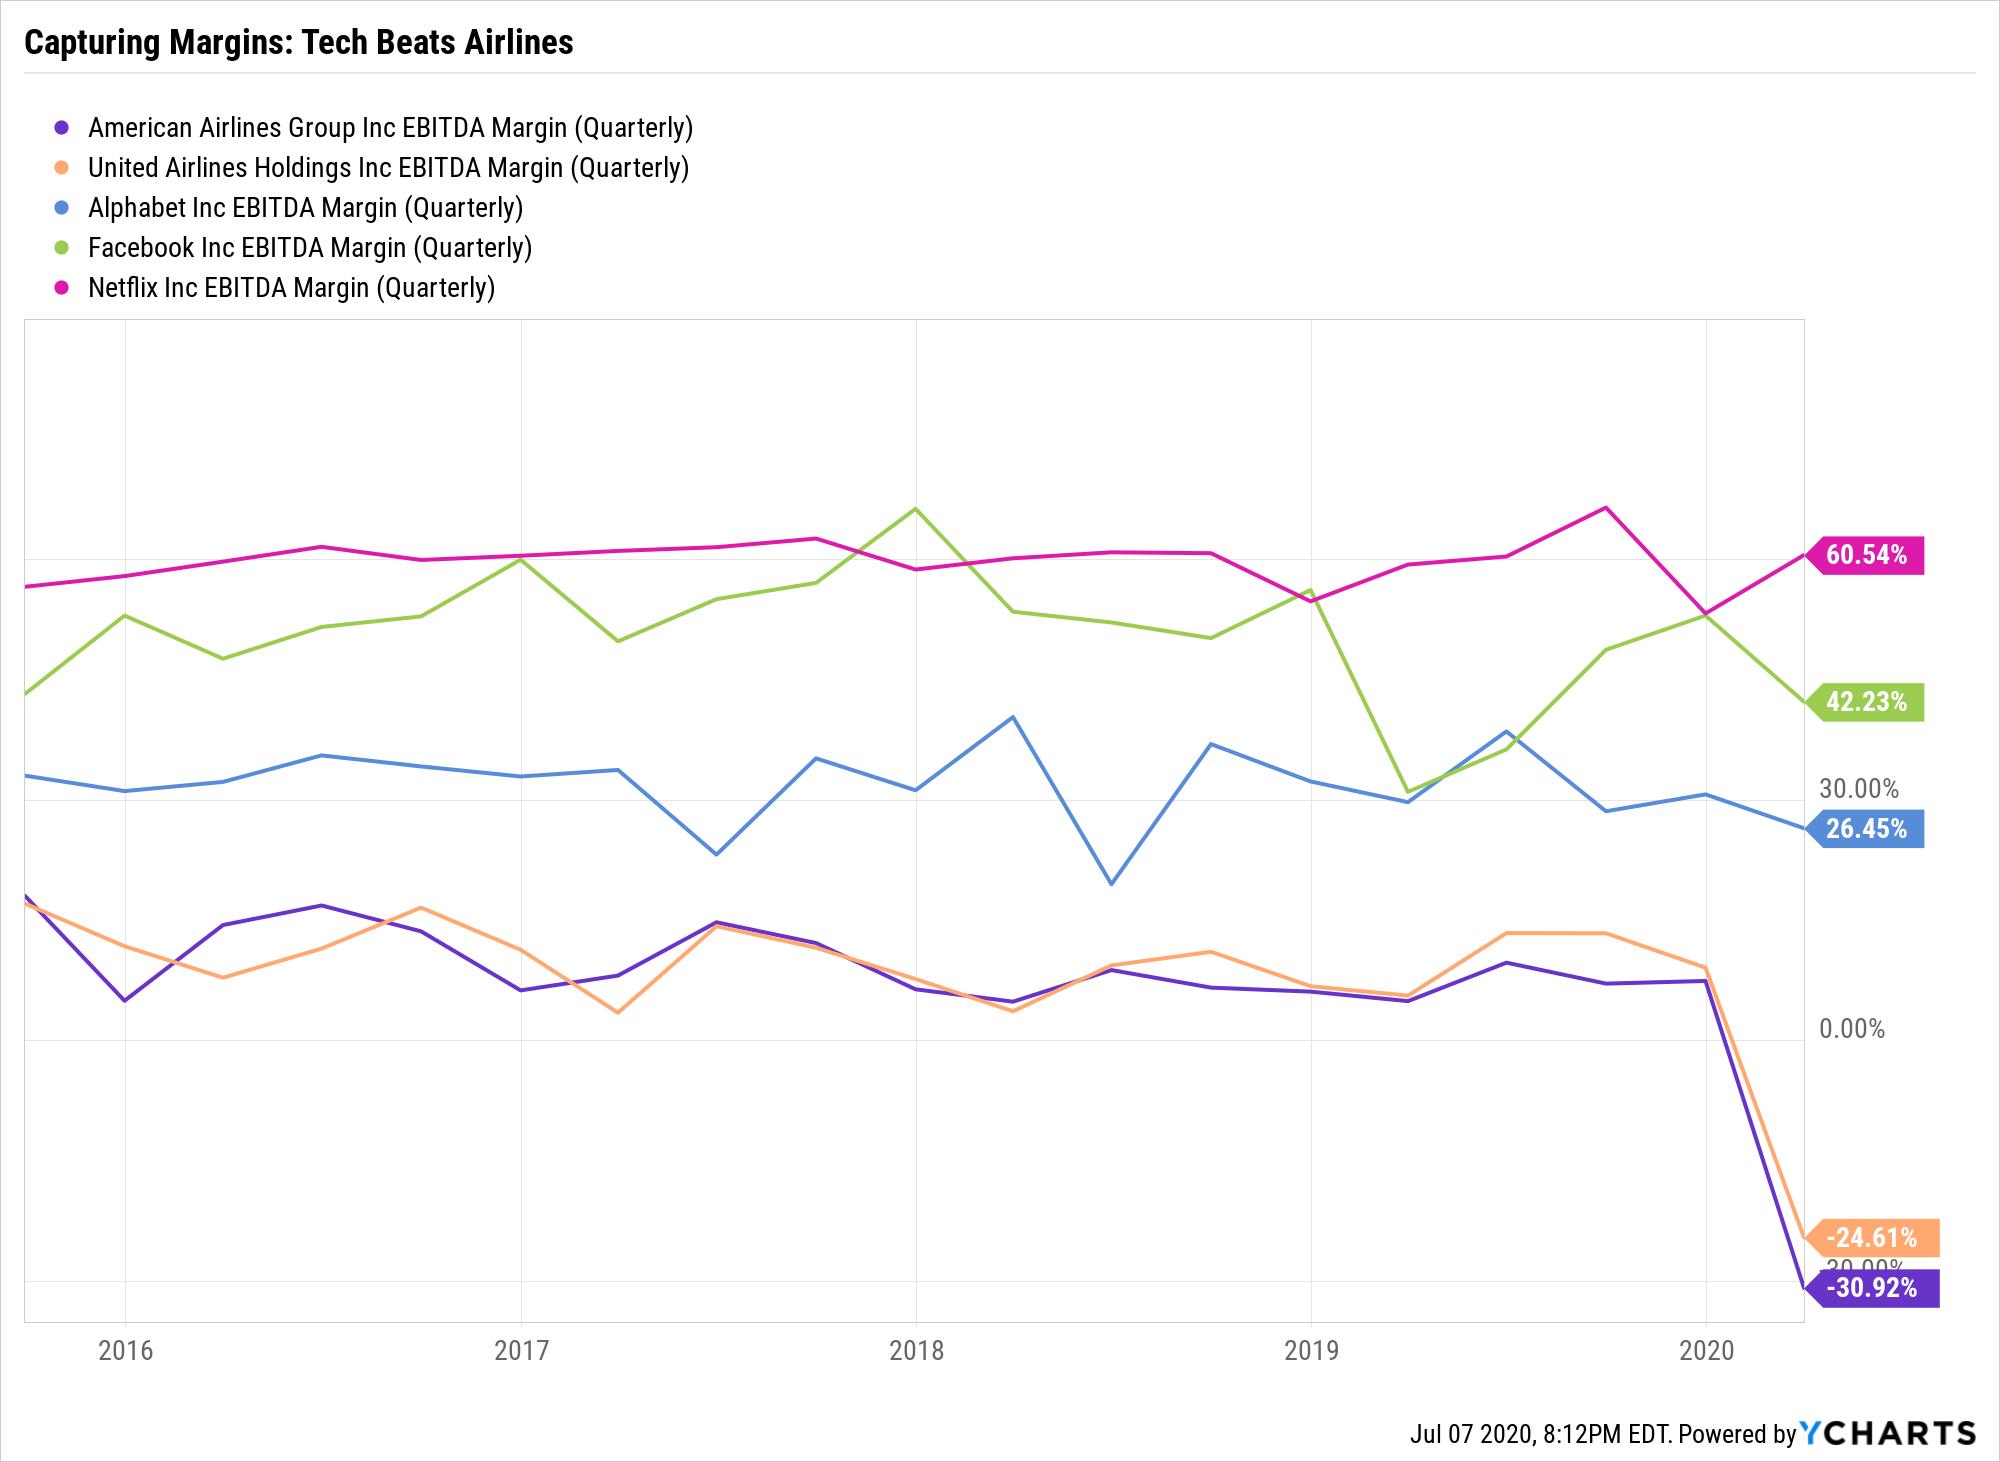 AAL EBITDA Margin (Quarterly) Chart